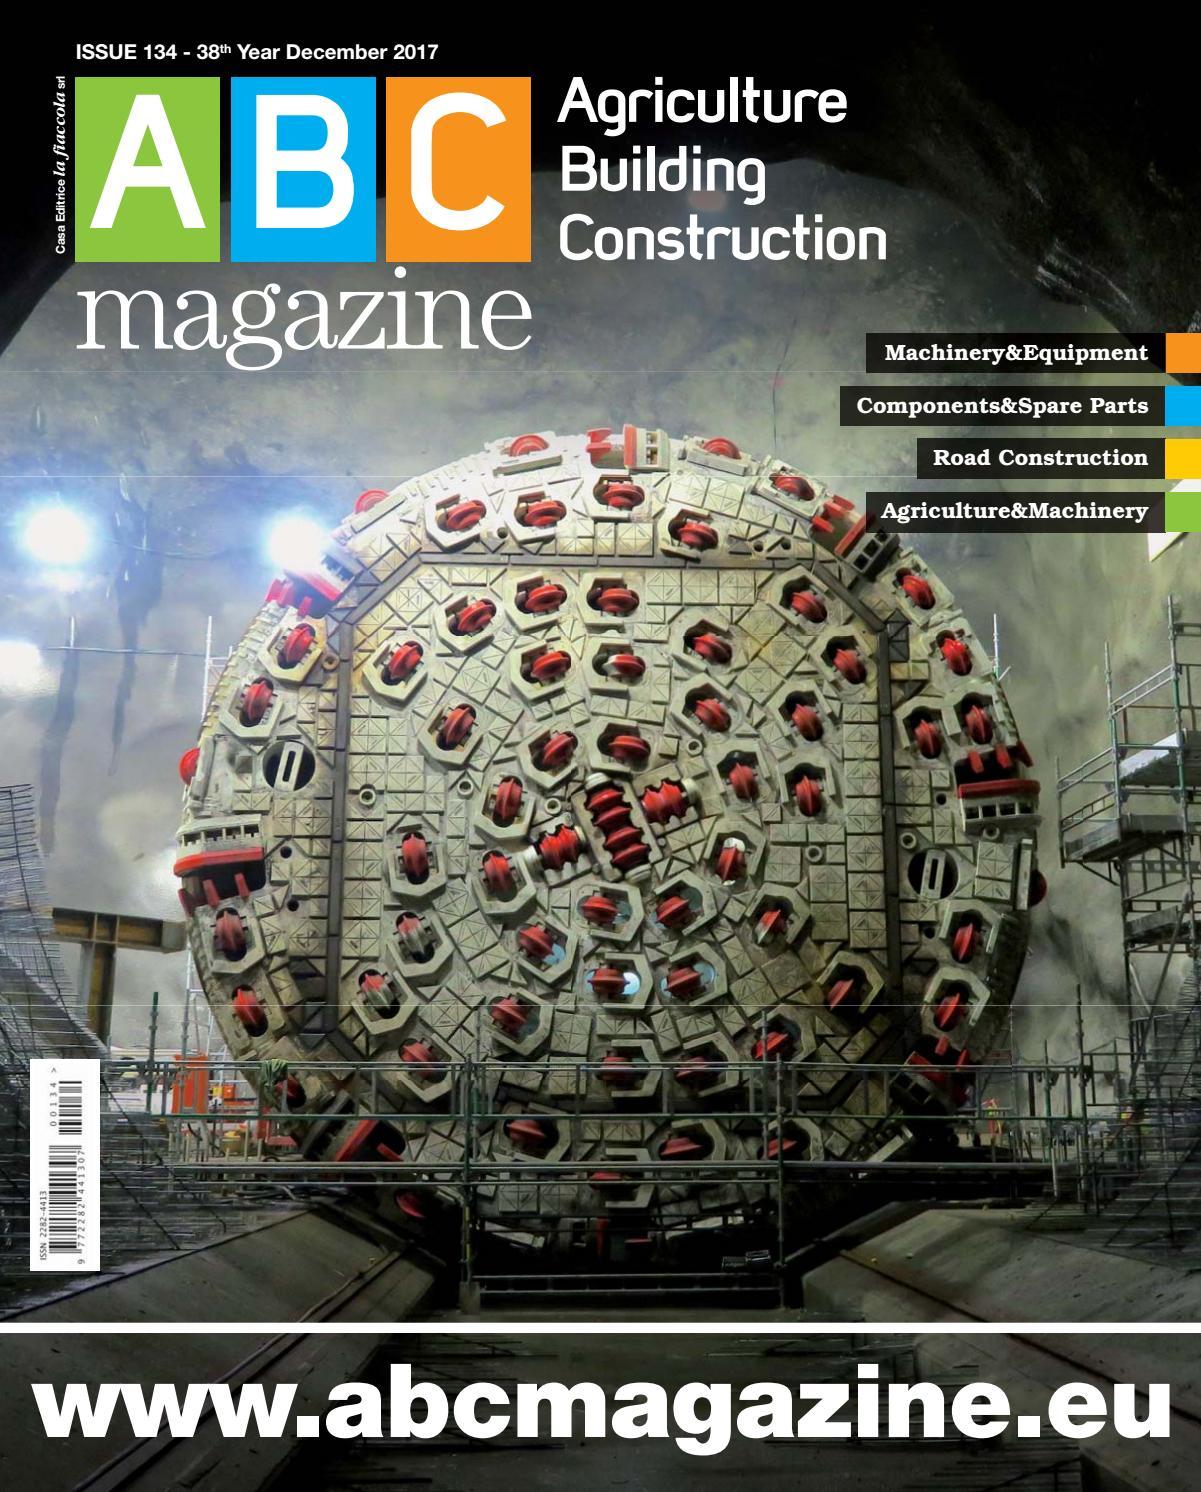 Abc december2017 by Casa Editrice la fiaccola srl - issuu